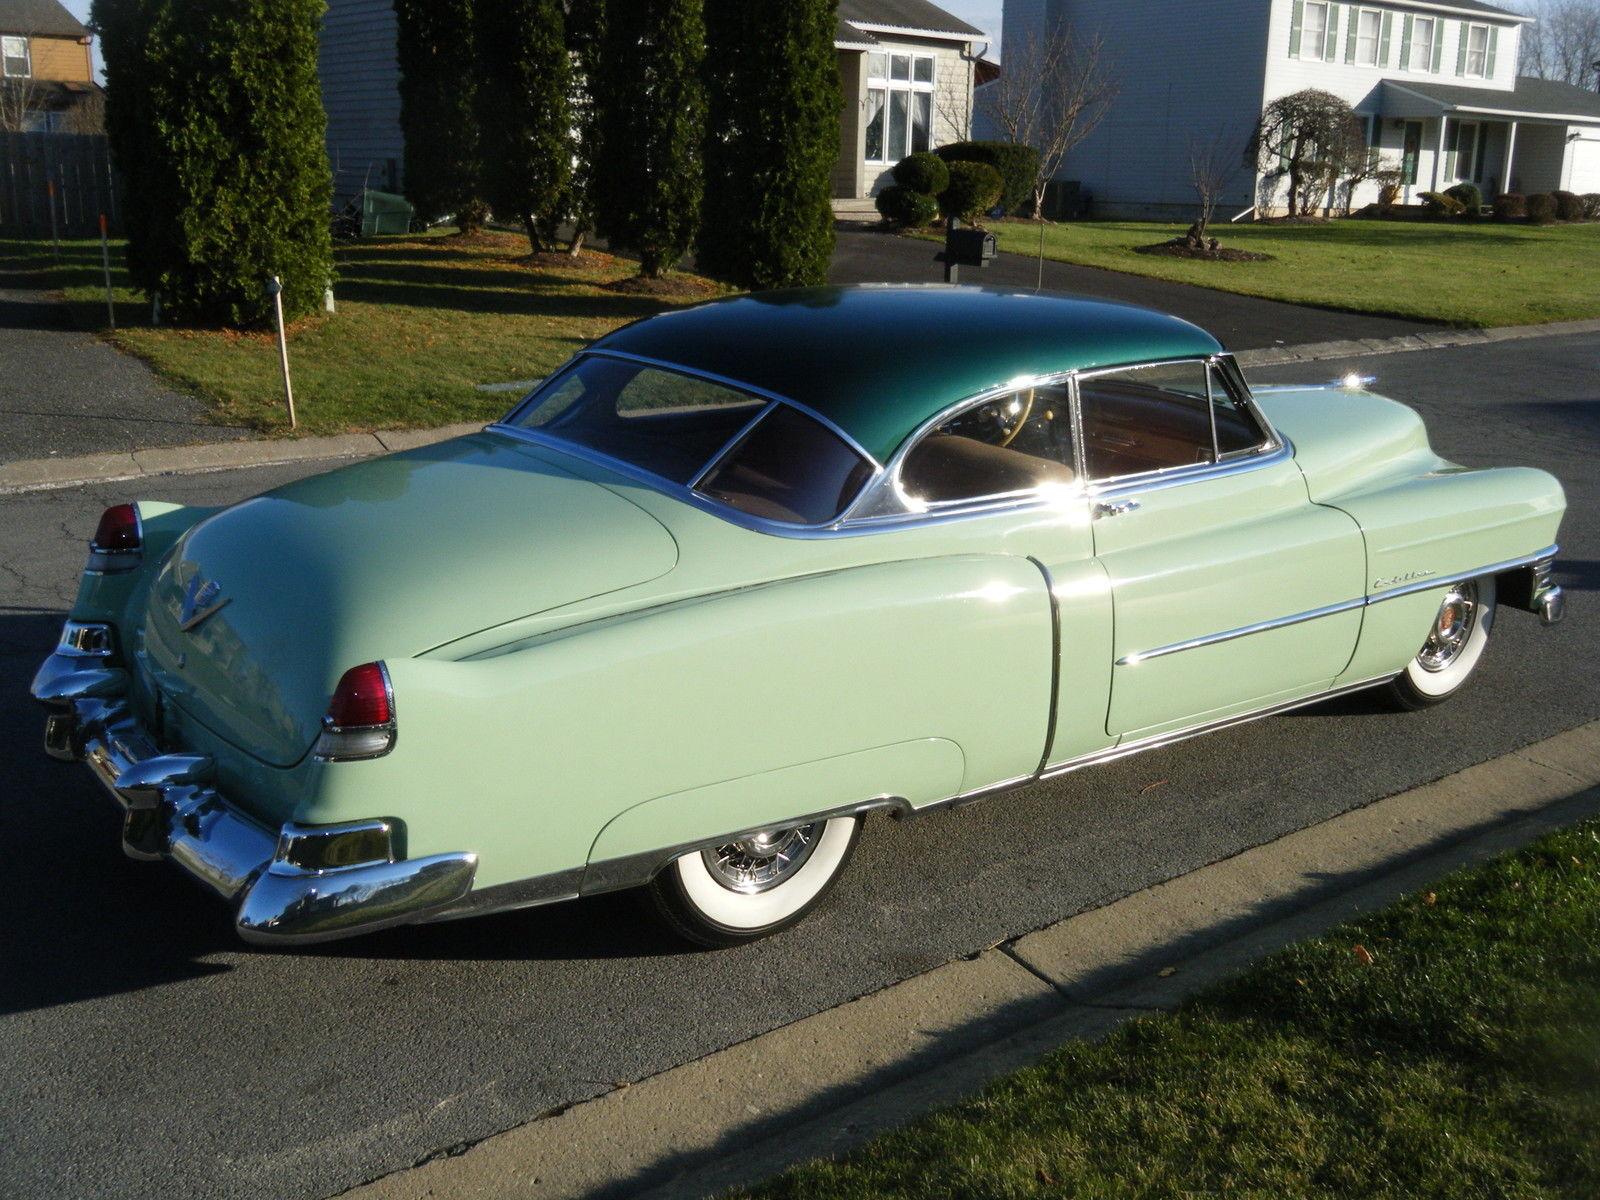 1951 Cadillac Coupe Rare Original Time Capsule 1950 1952 1953 Deville For Sale 1959 1960